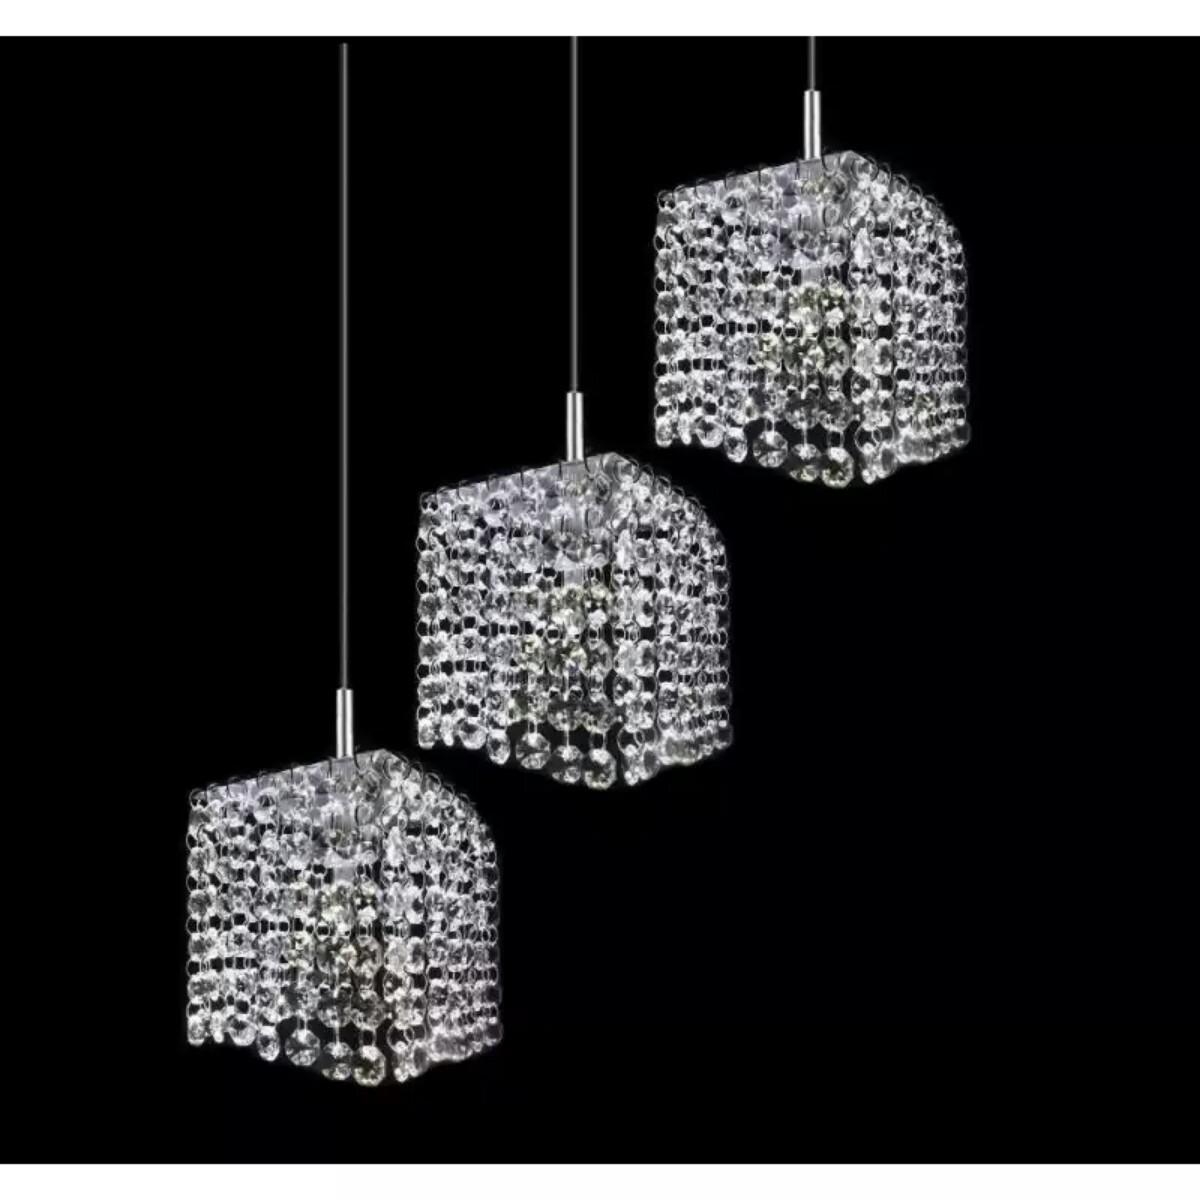 lustre pendente de cristal legitimo lustres cp design elo7. Black Bedroom Furniture Sets. Home Design Ideas